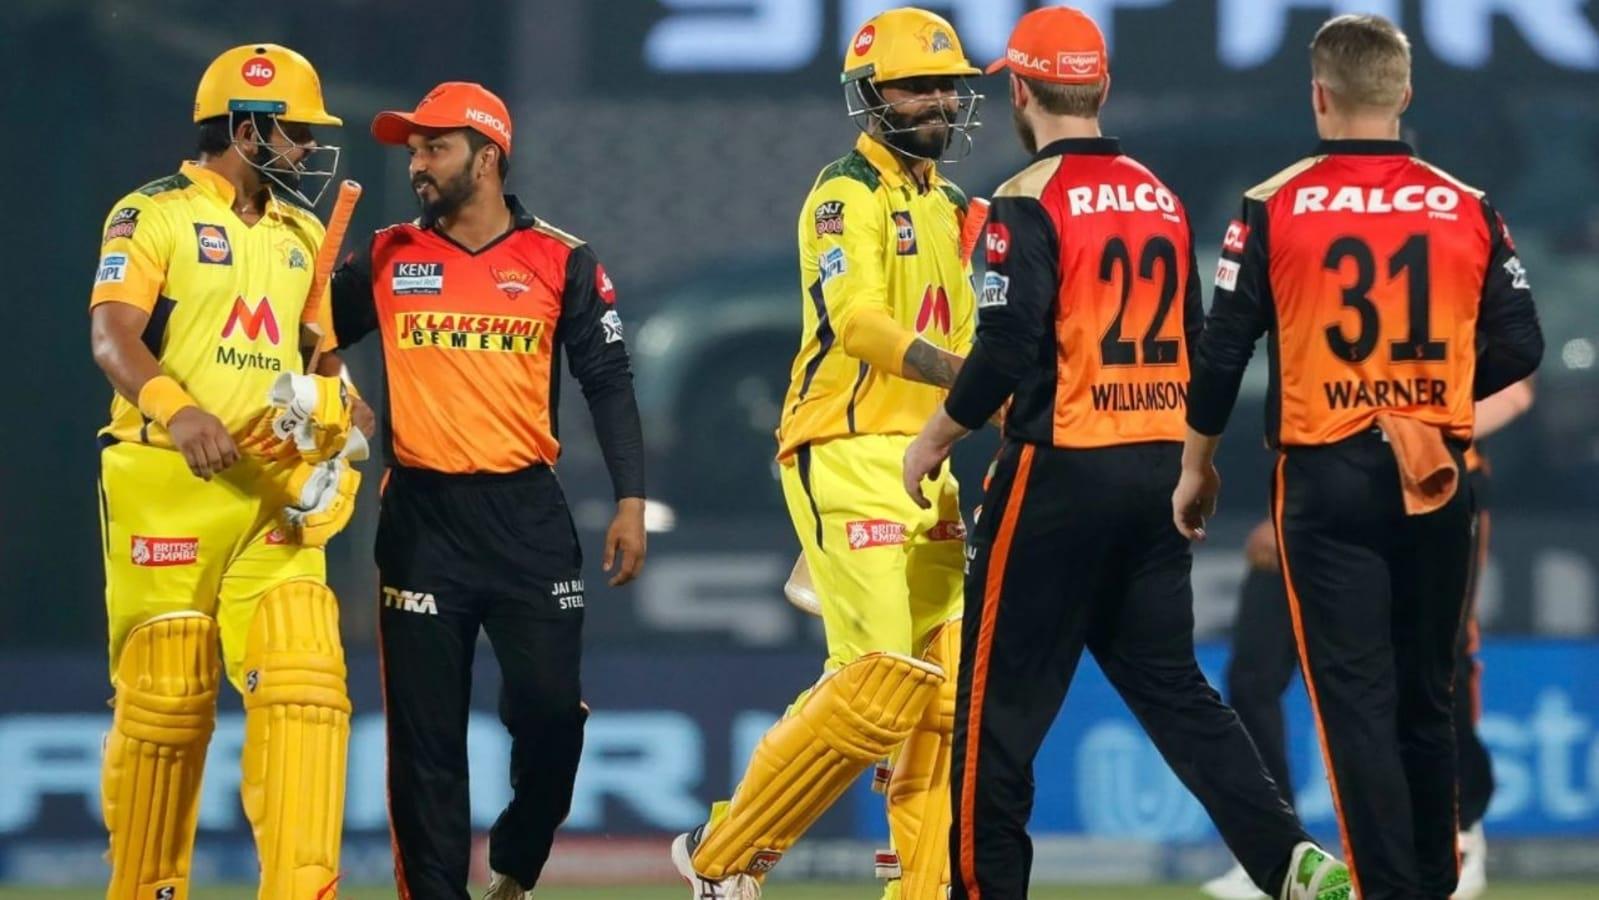 IPL 2021 CSK vs SRH Highlights: Chennai Super Kings beat Sunrisers Hyderabad by 7 wickets | Hindustan Times